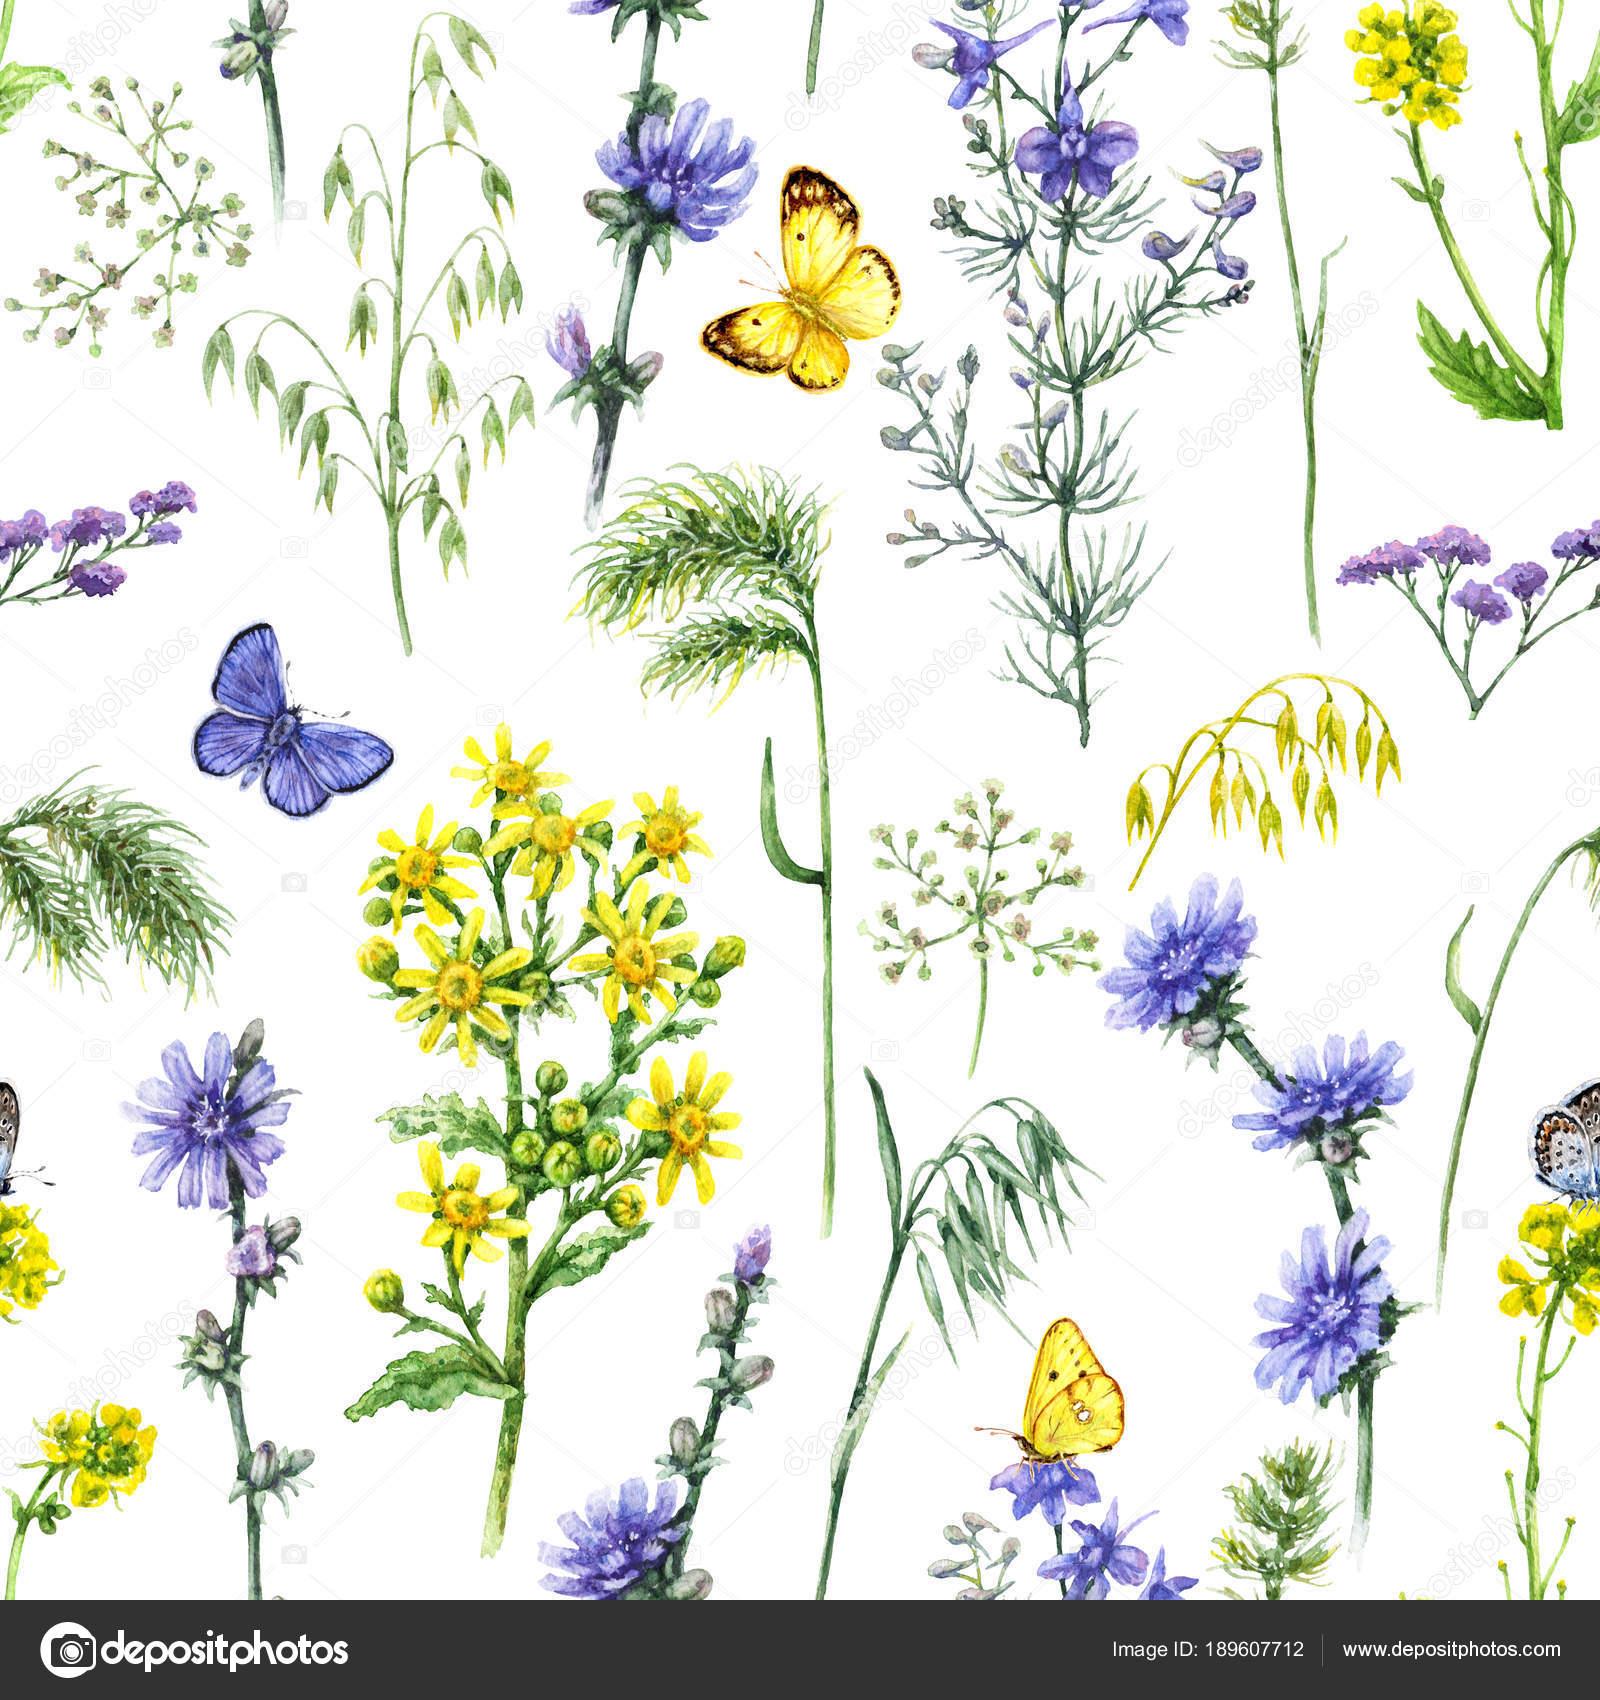 Dessin de fleurs de champ bleu et jaune\u2013 images de stock libres de droits